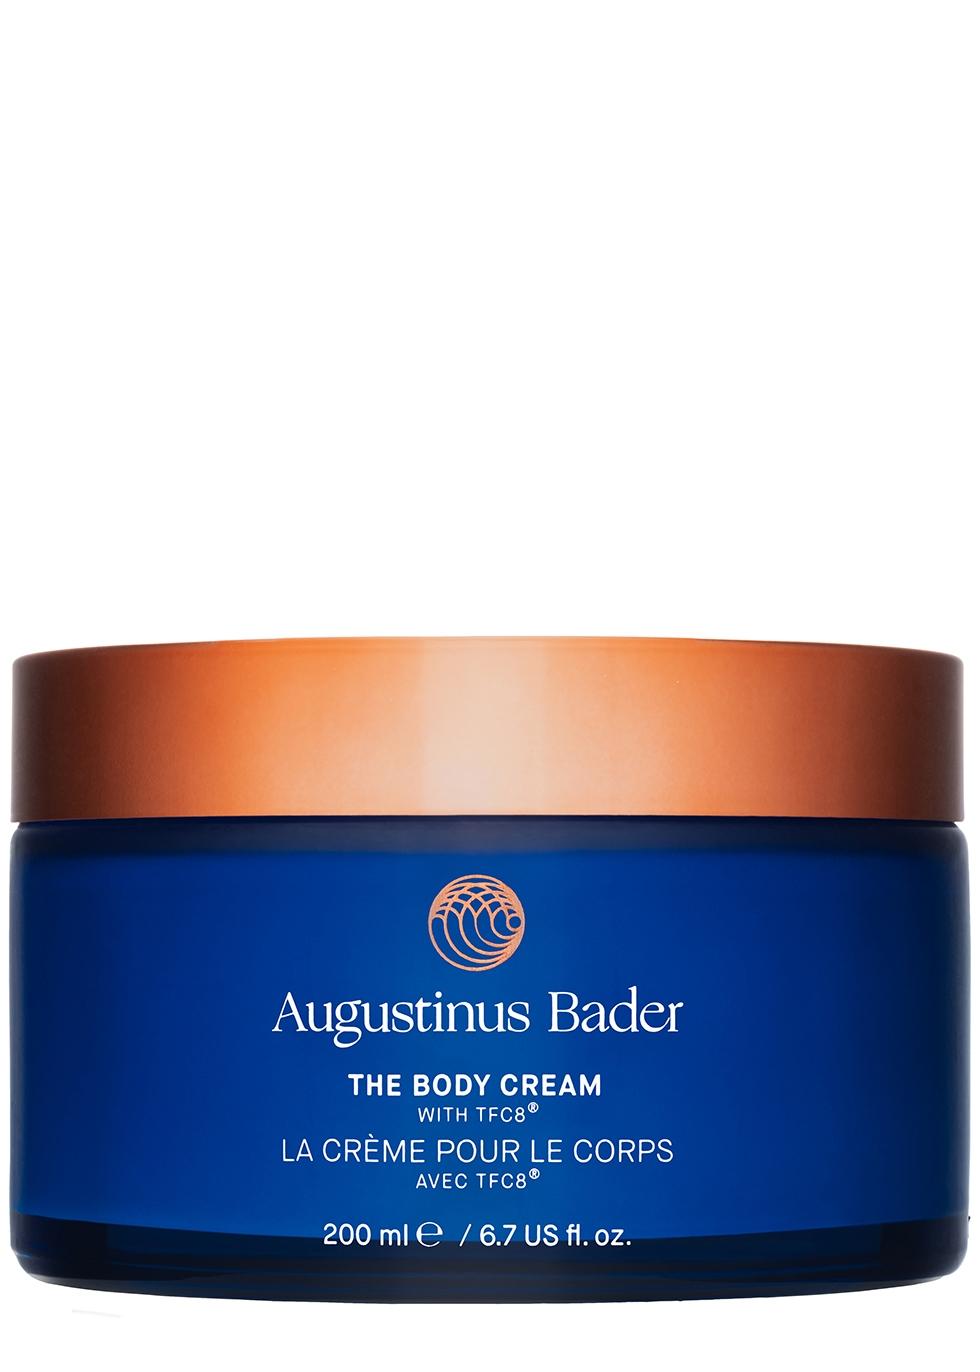 The Body Cream 200ml